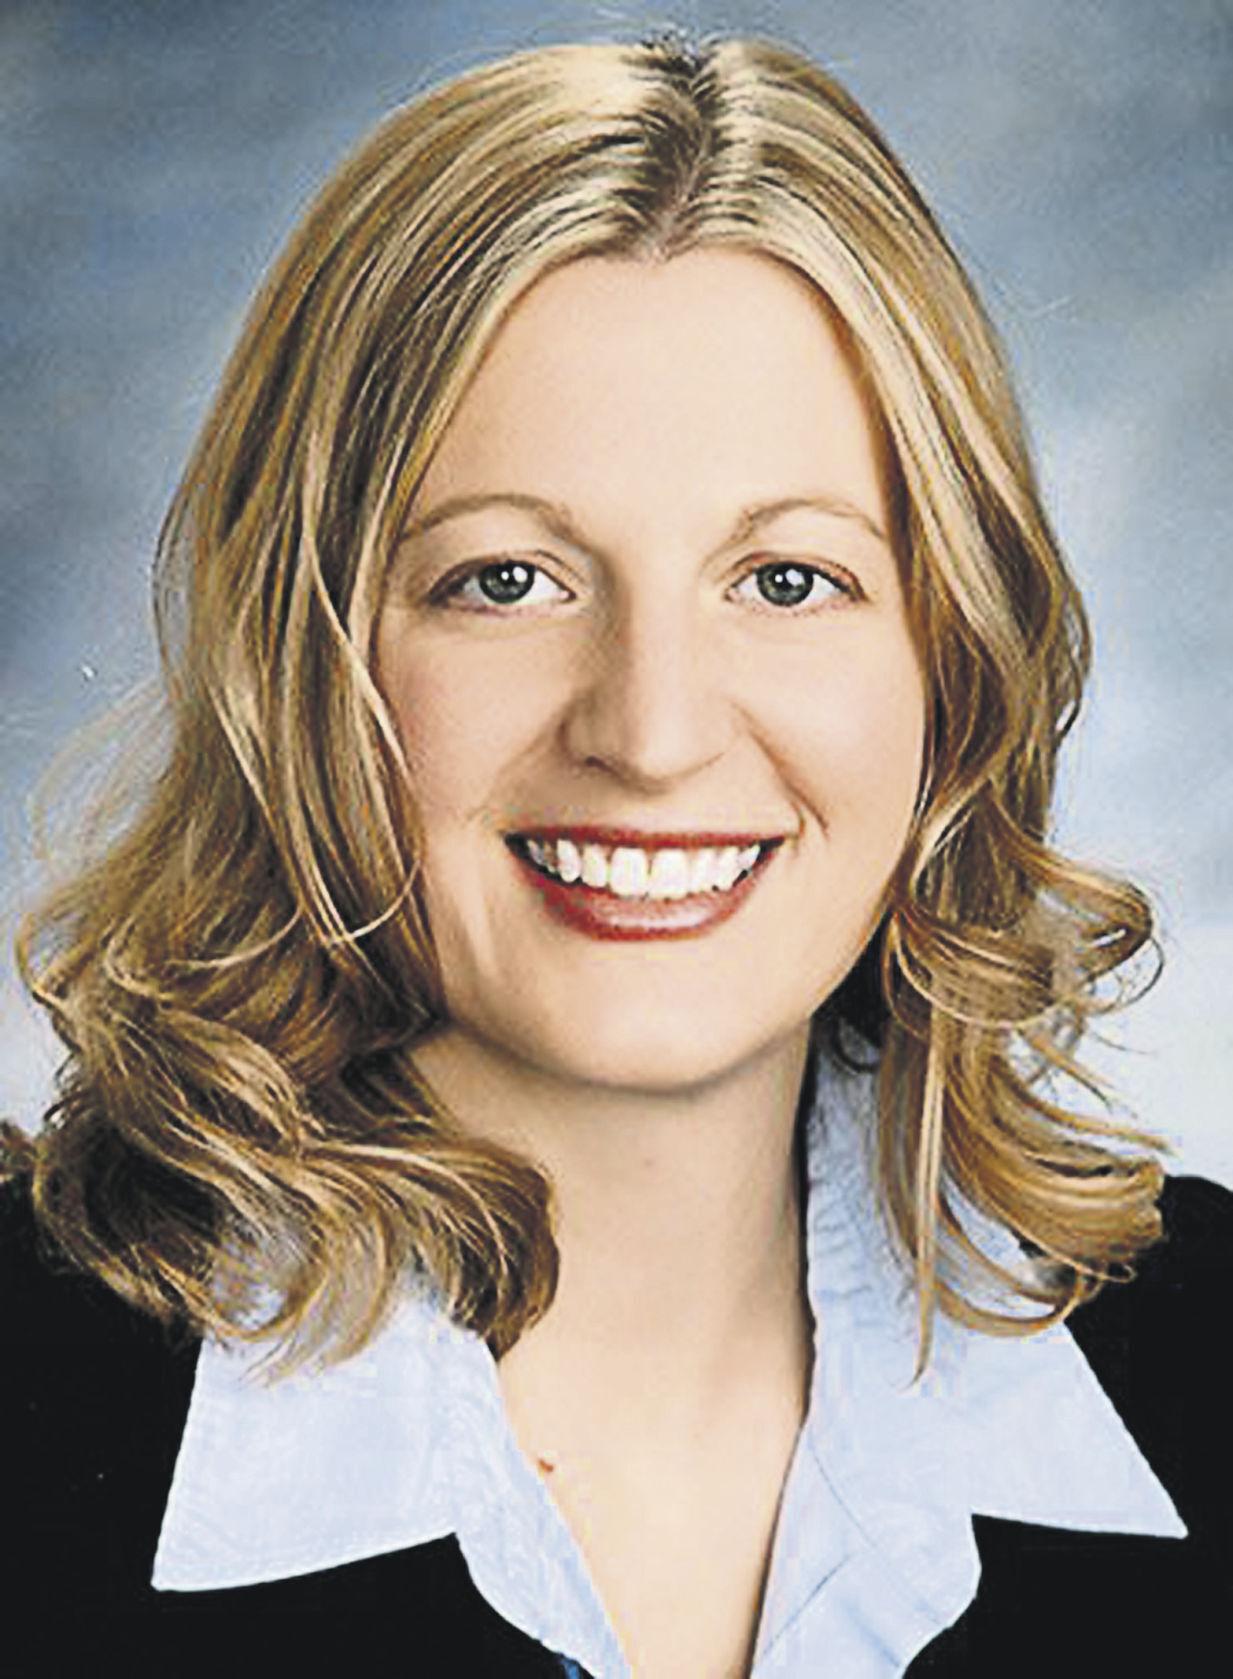 Alexis Steger